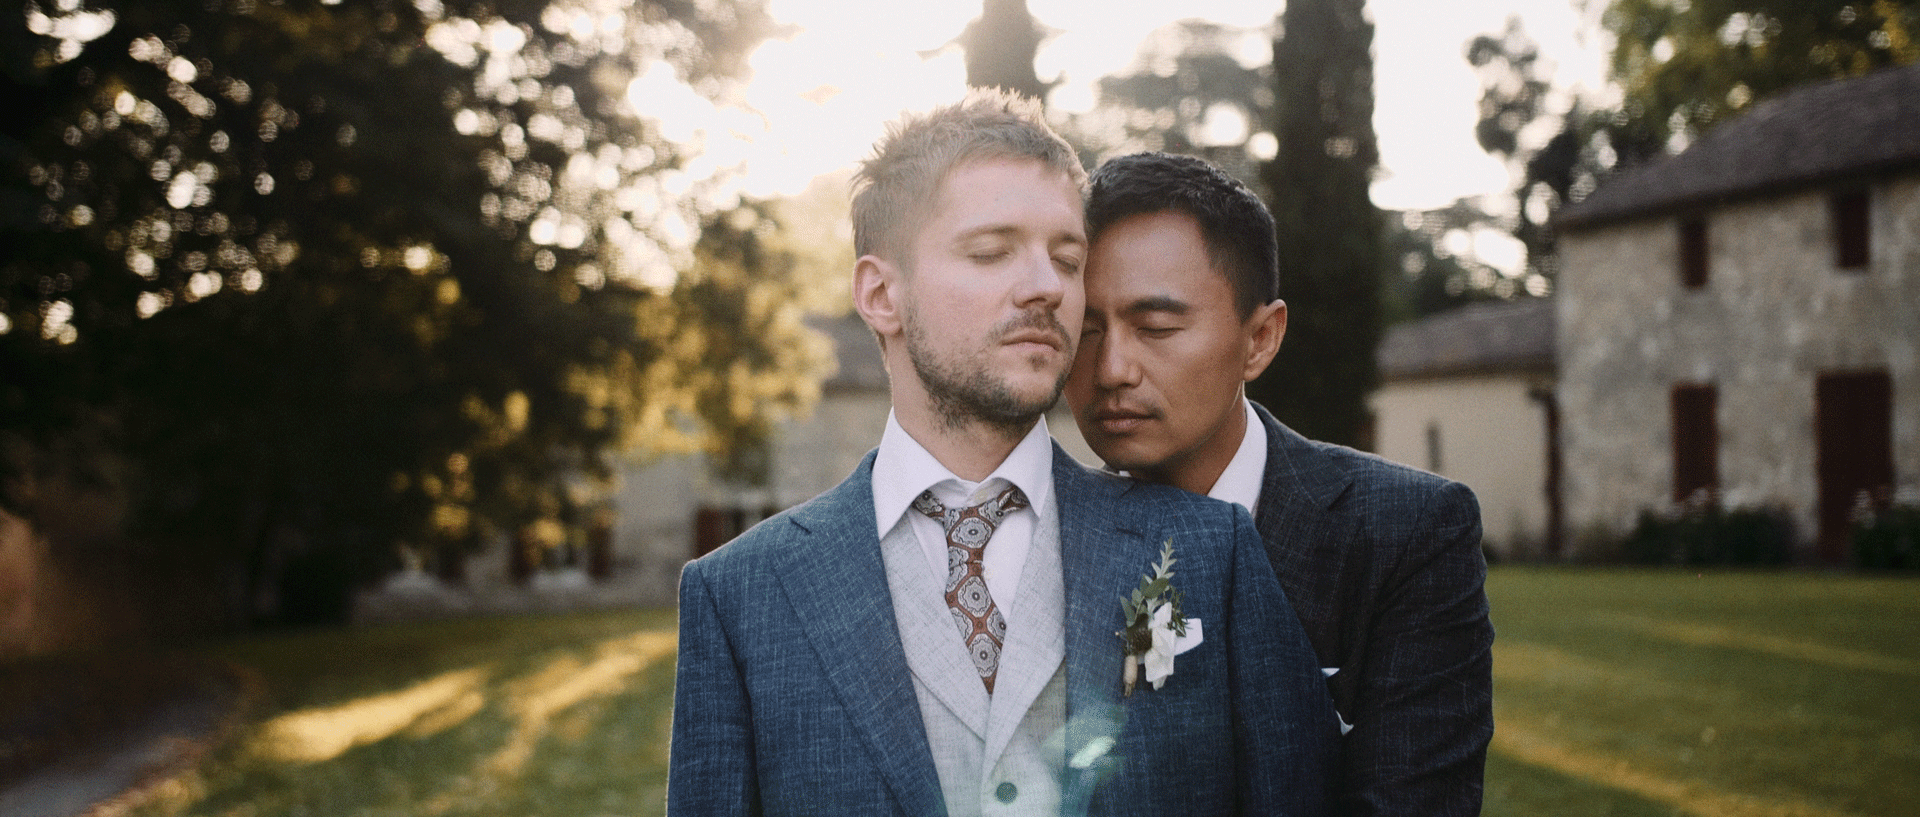 Sam & David - An elegant & intense international gay weddingChâteau de Poudenas - South West of France